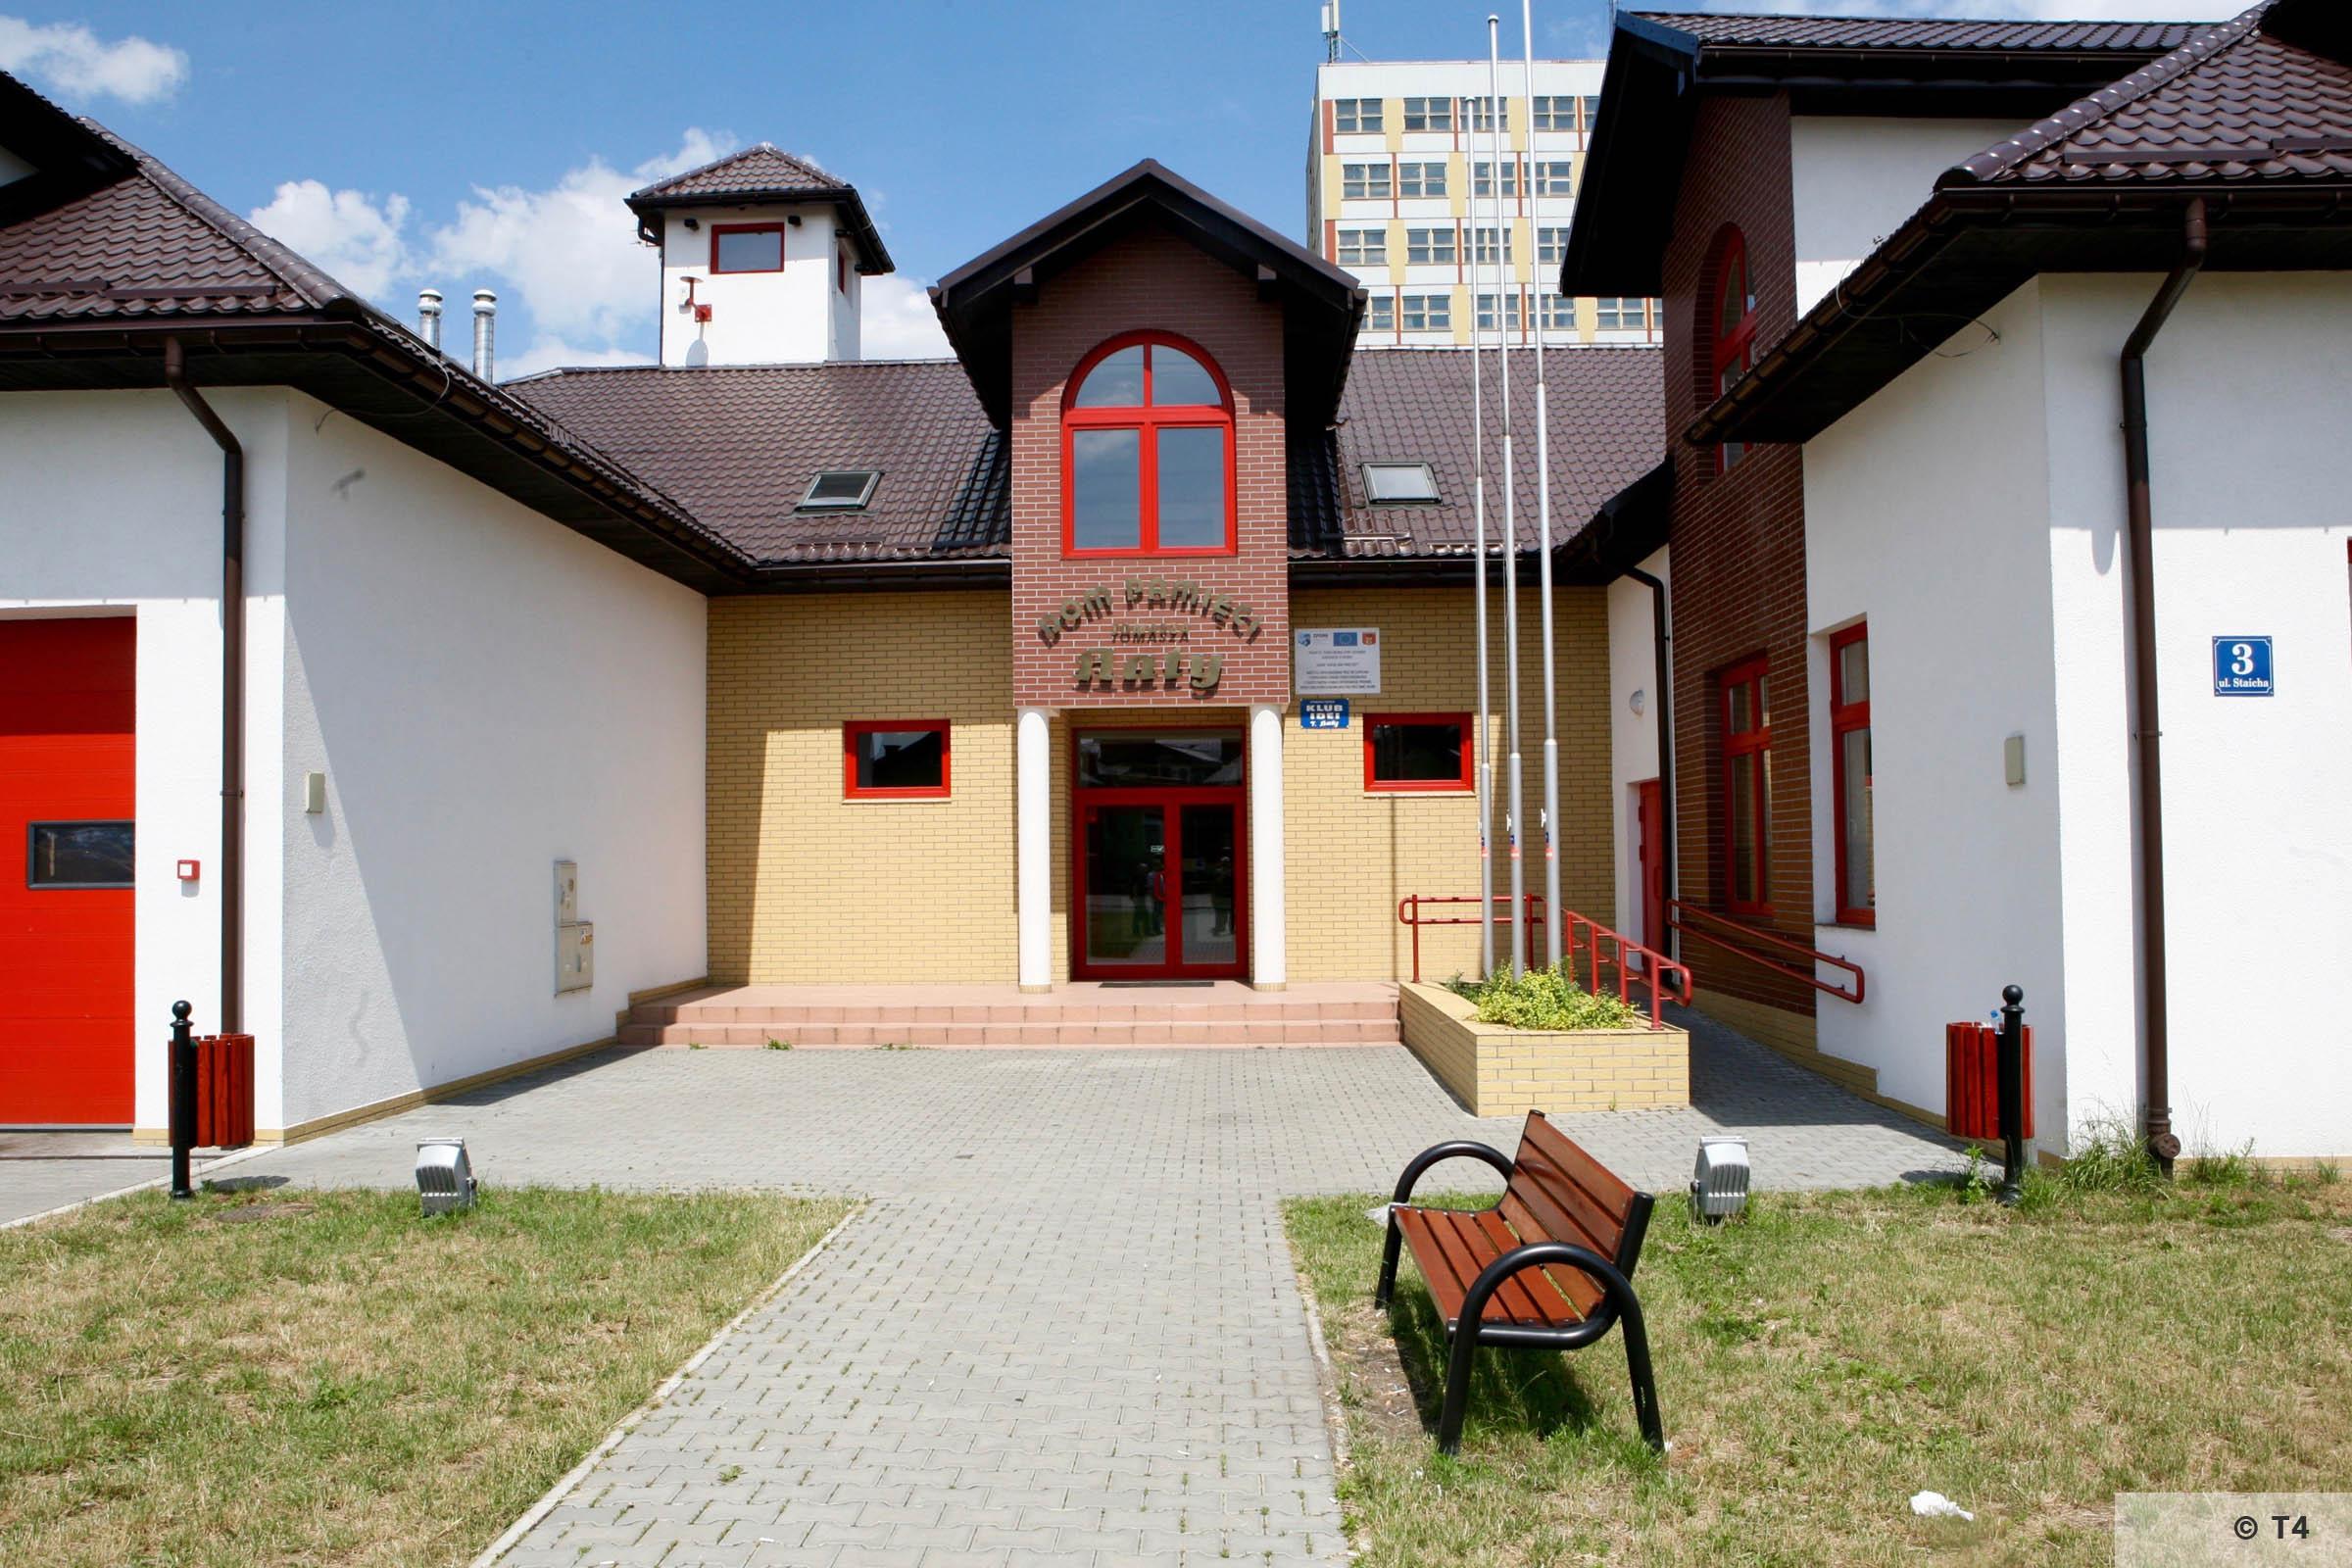 Tomasz Bata Memorial House. 2007 T4 4720